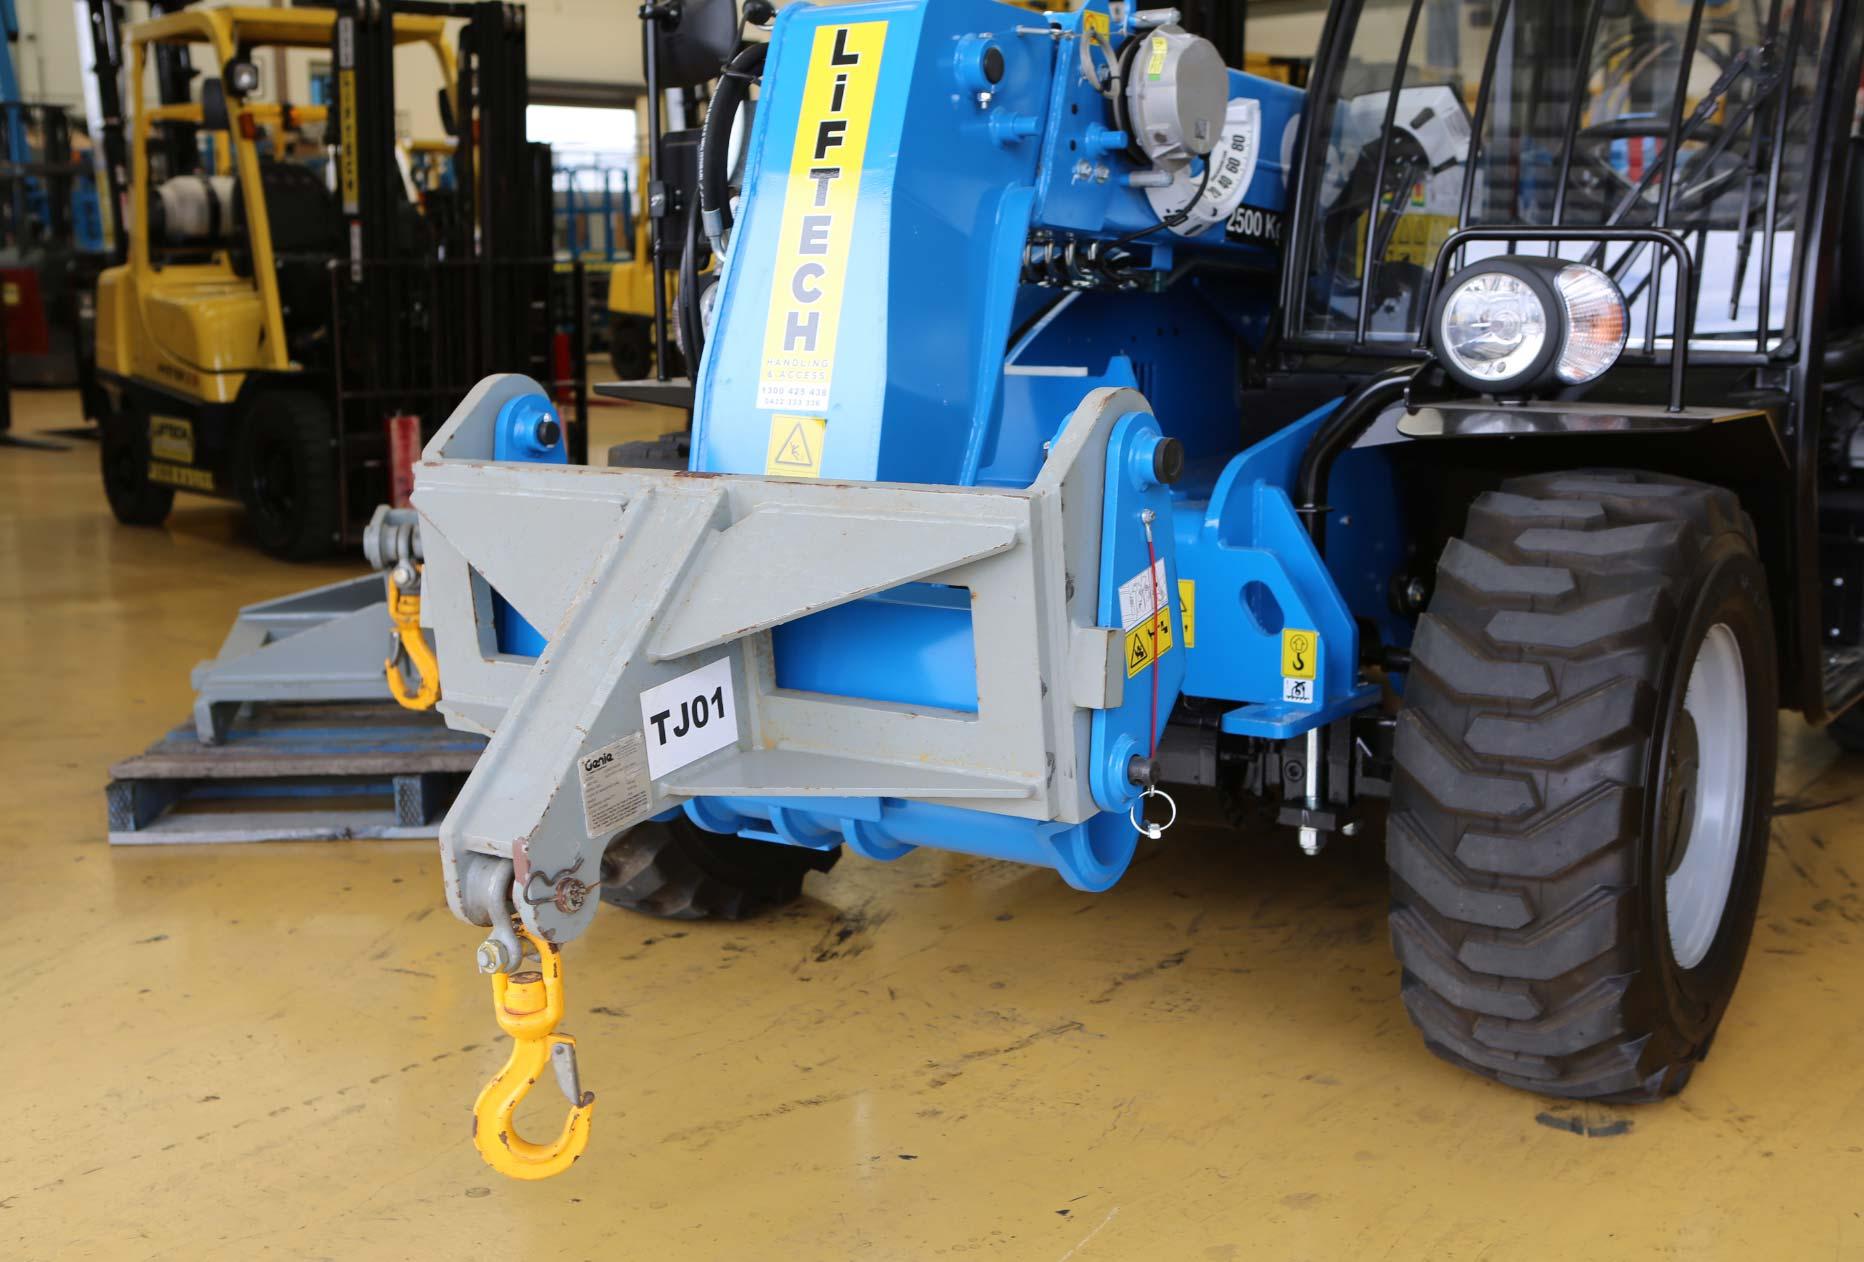 2.5 Tonne Telehandler Forklift's Attachment